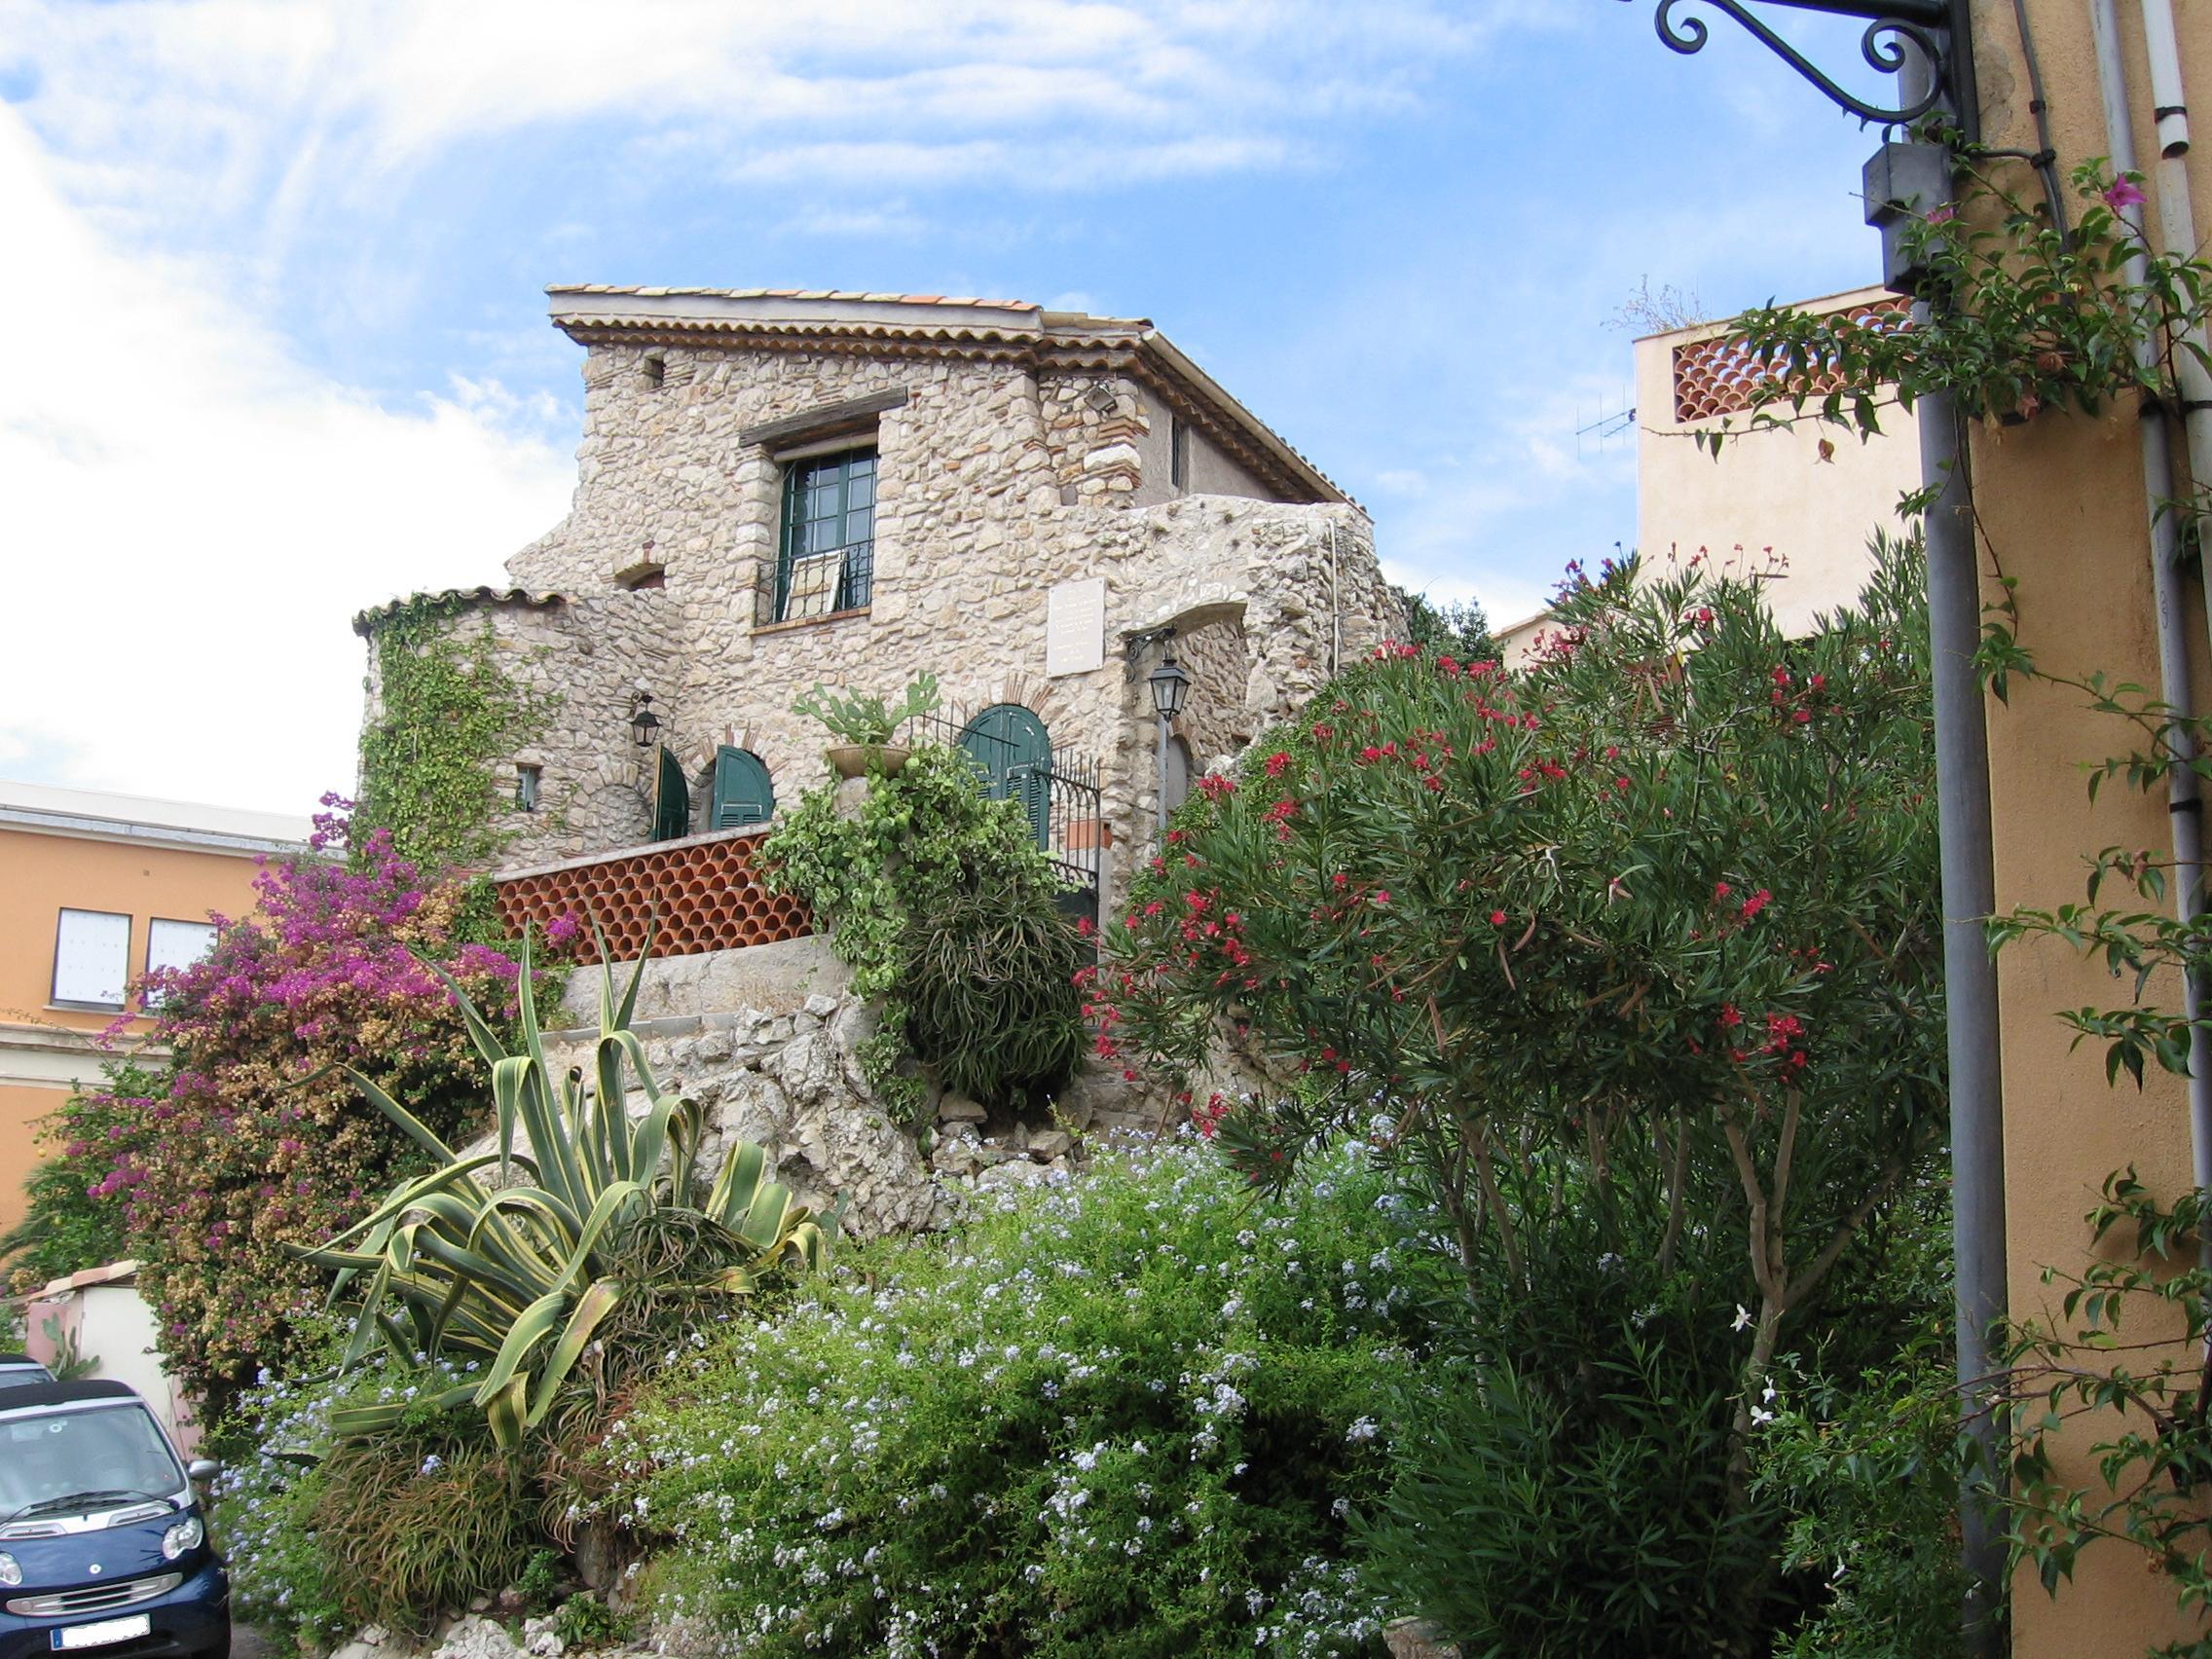 File:Villa du vieil Antibes.jpg - Wikimedia Commons